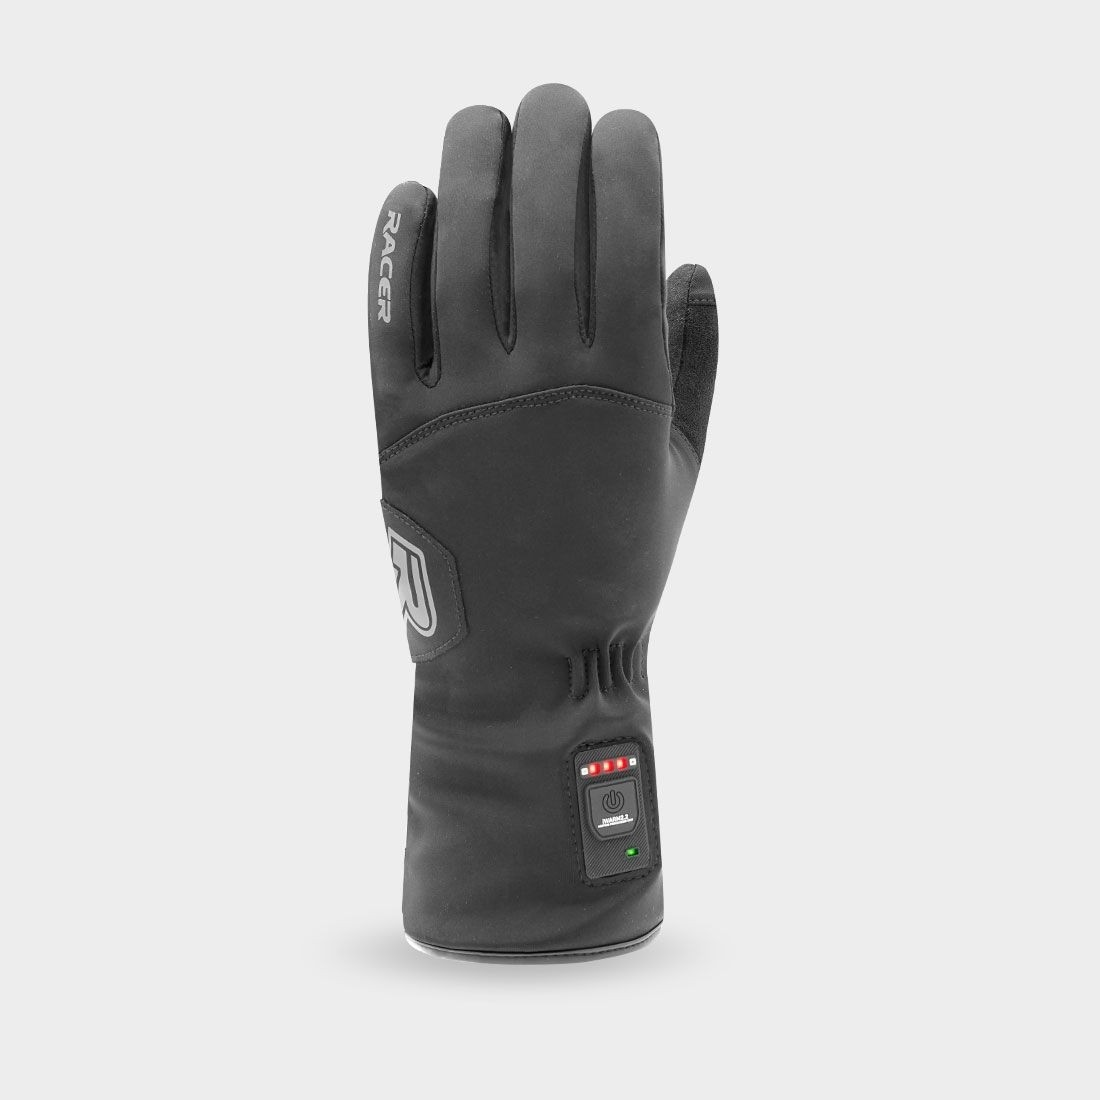 Racer  Handschuh  , geheizt, schwarz